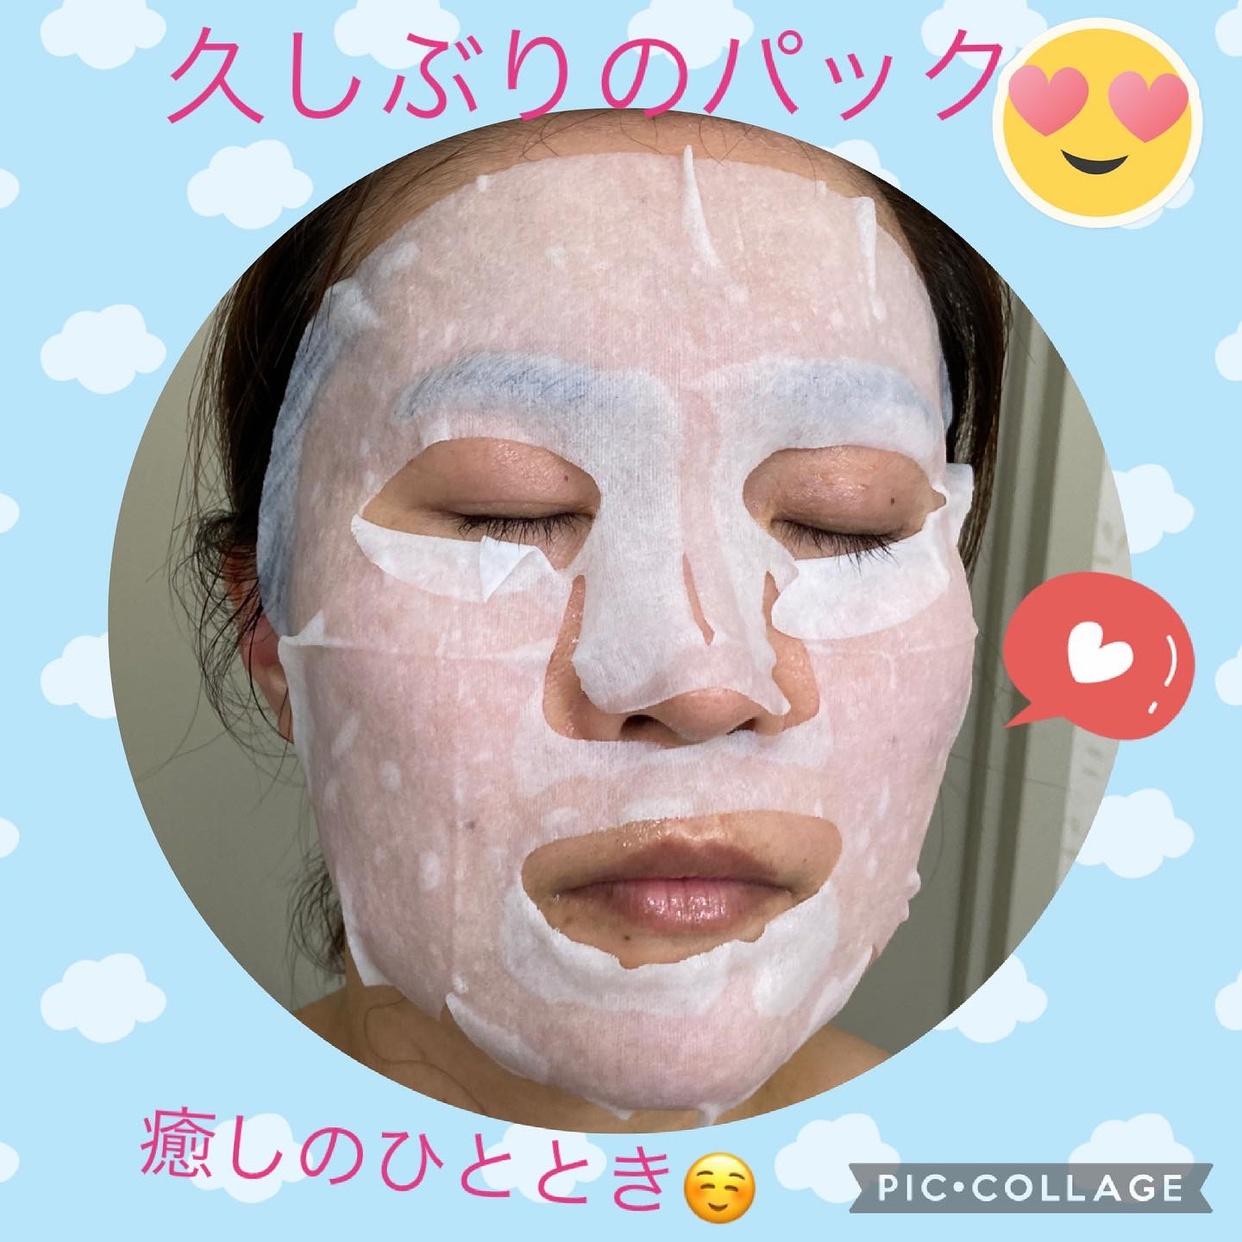 DERMAL(ダーマル) 金コラーゲン エッセンスマスクに関するのんびりのび子さんの口コミ画像1